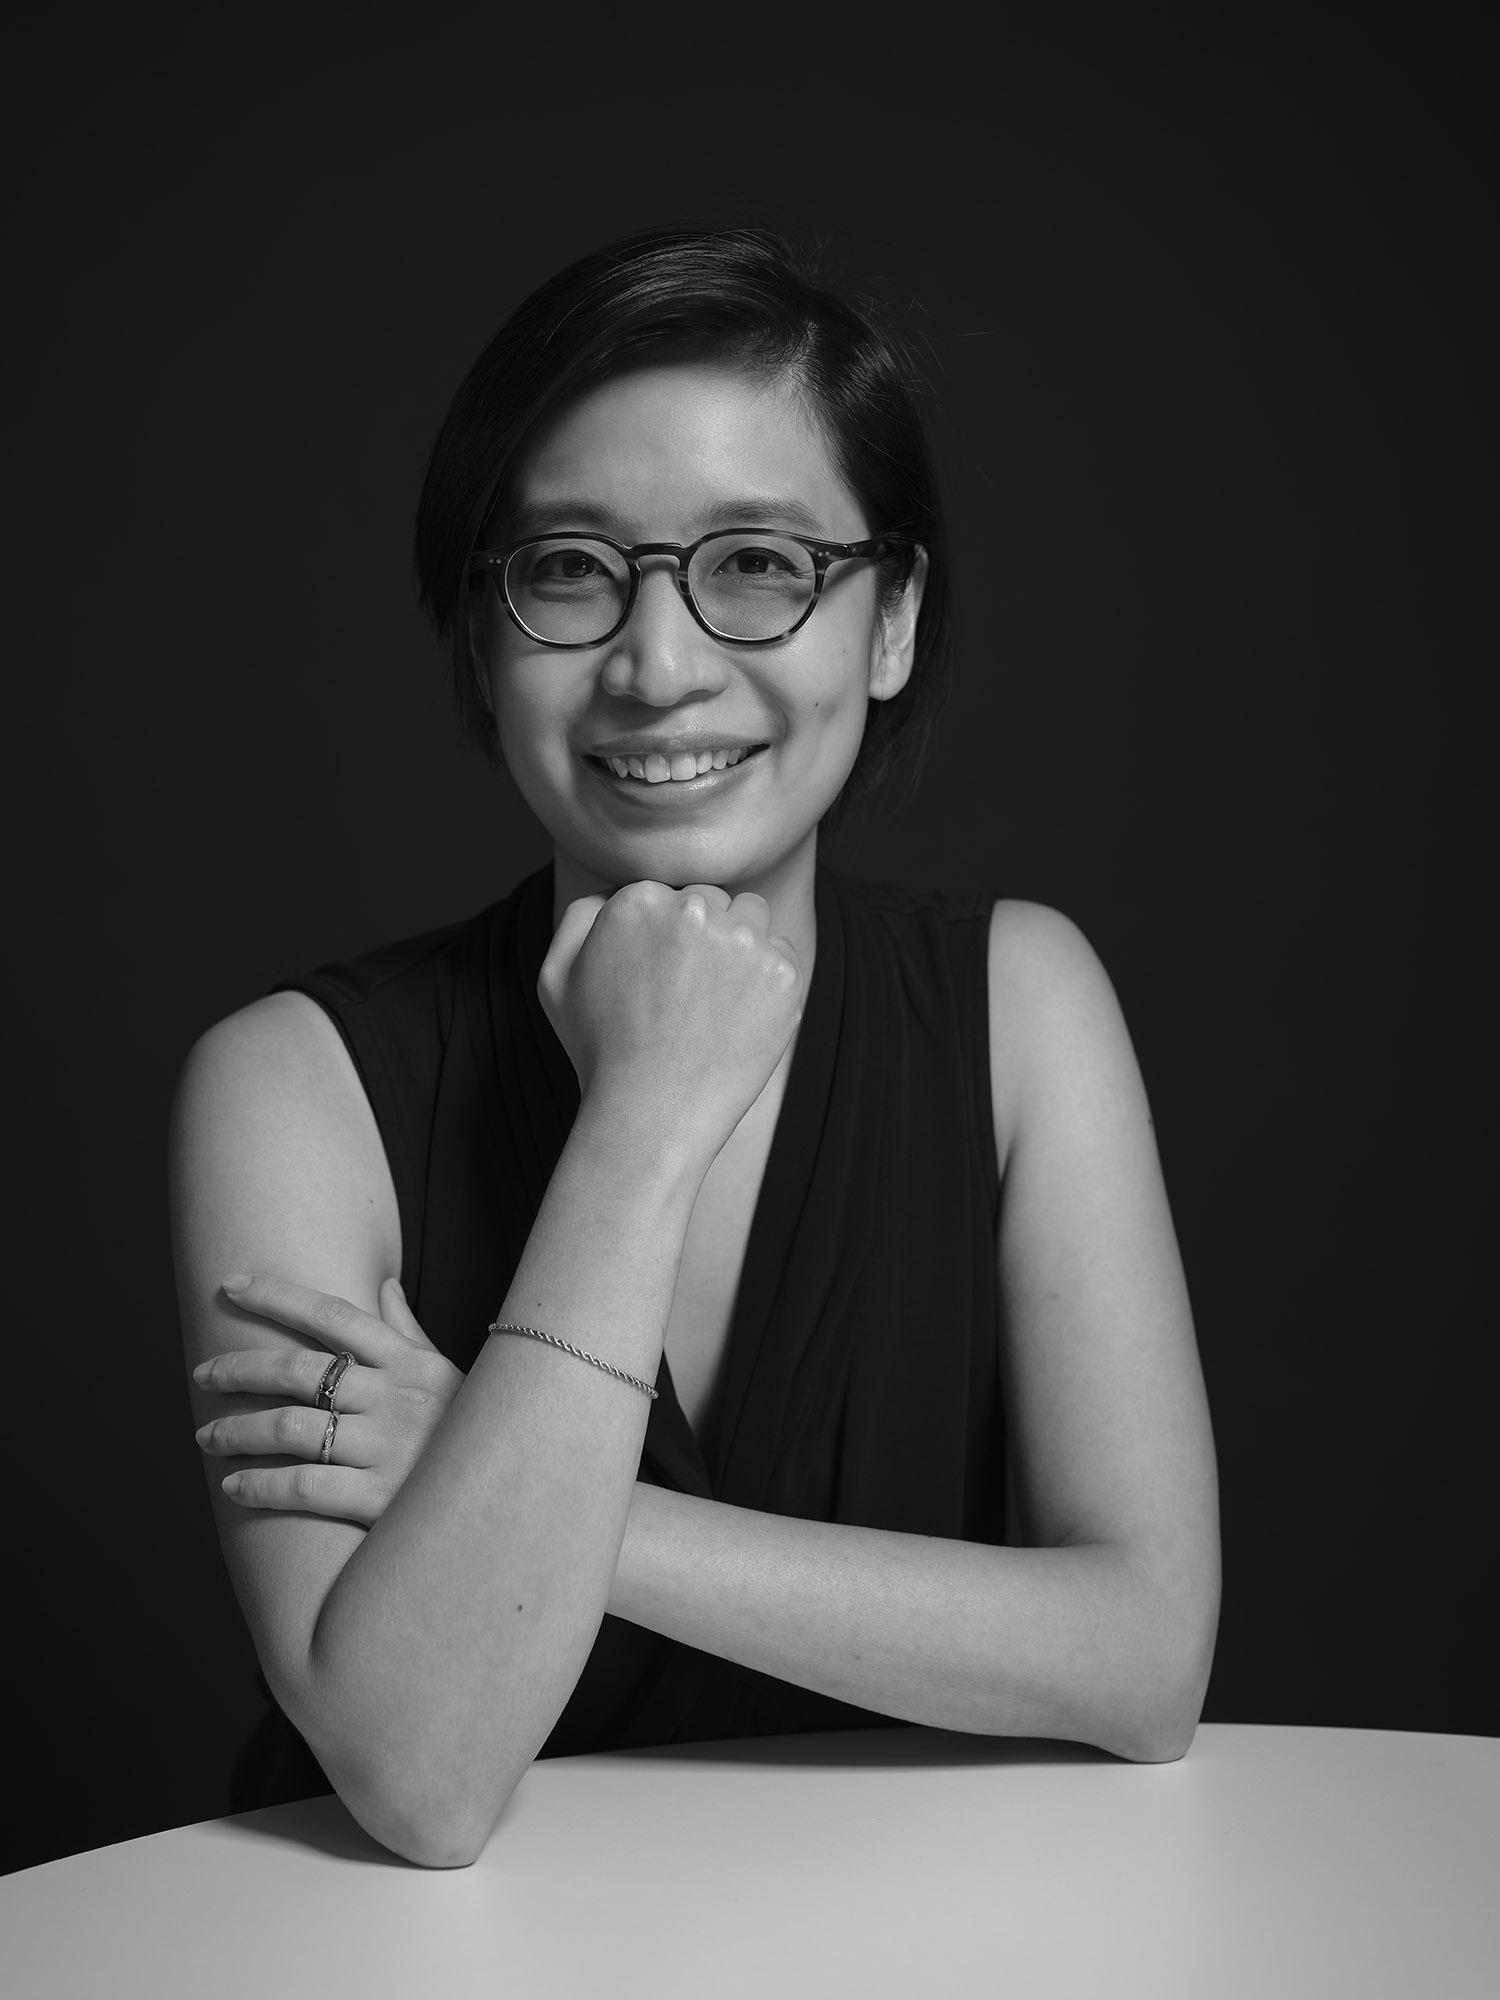 Ramboll Black and White Photography Portrait Photographer Singapore COCO Creative Studio 58